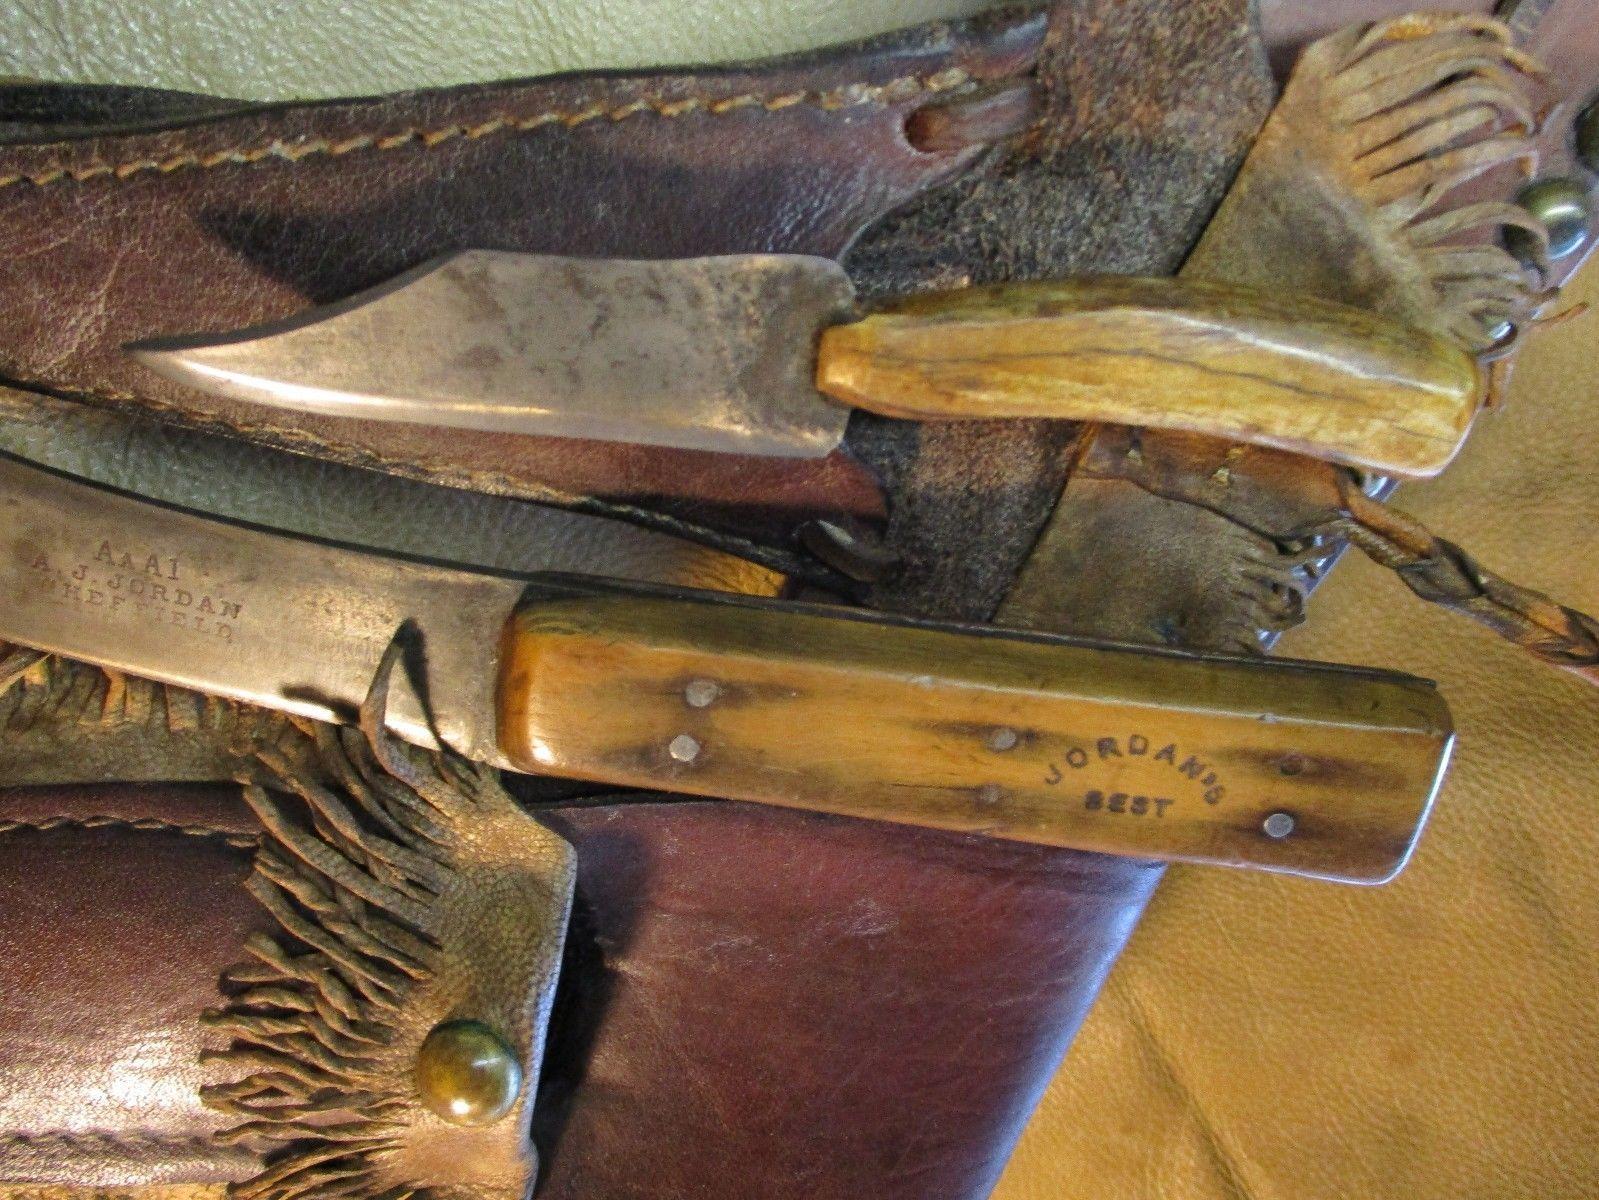 Sheffield Trade Knife & Trappers Neck Knife, Buffalo Knife